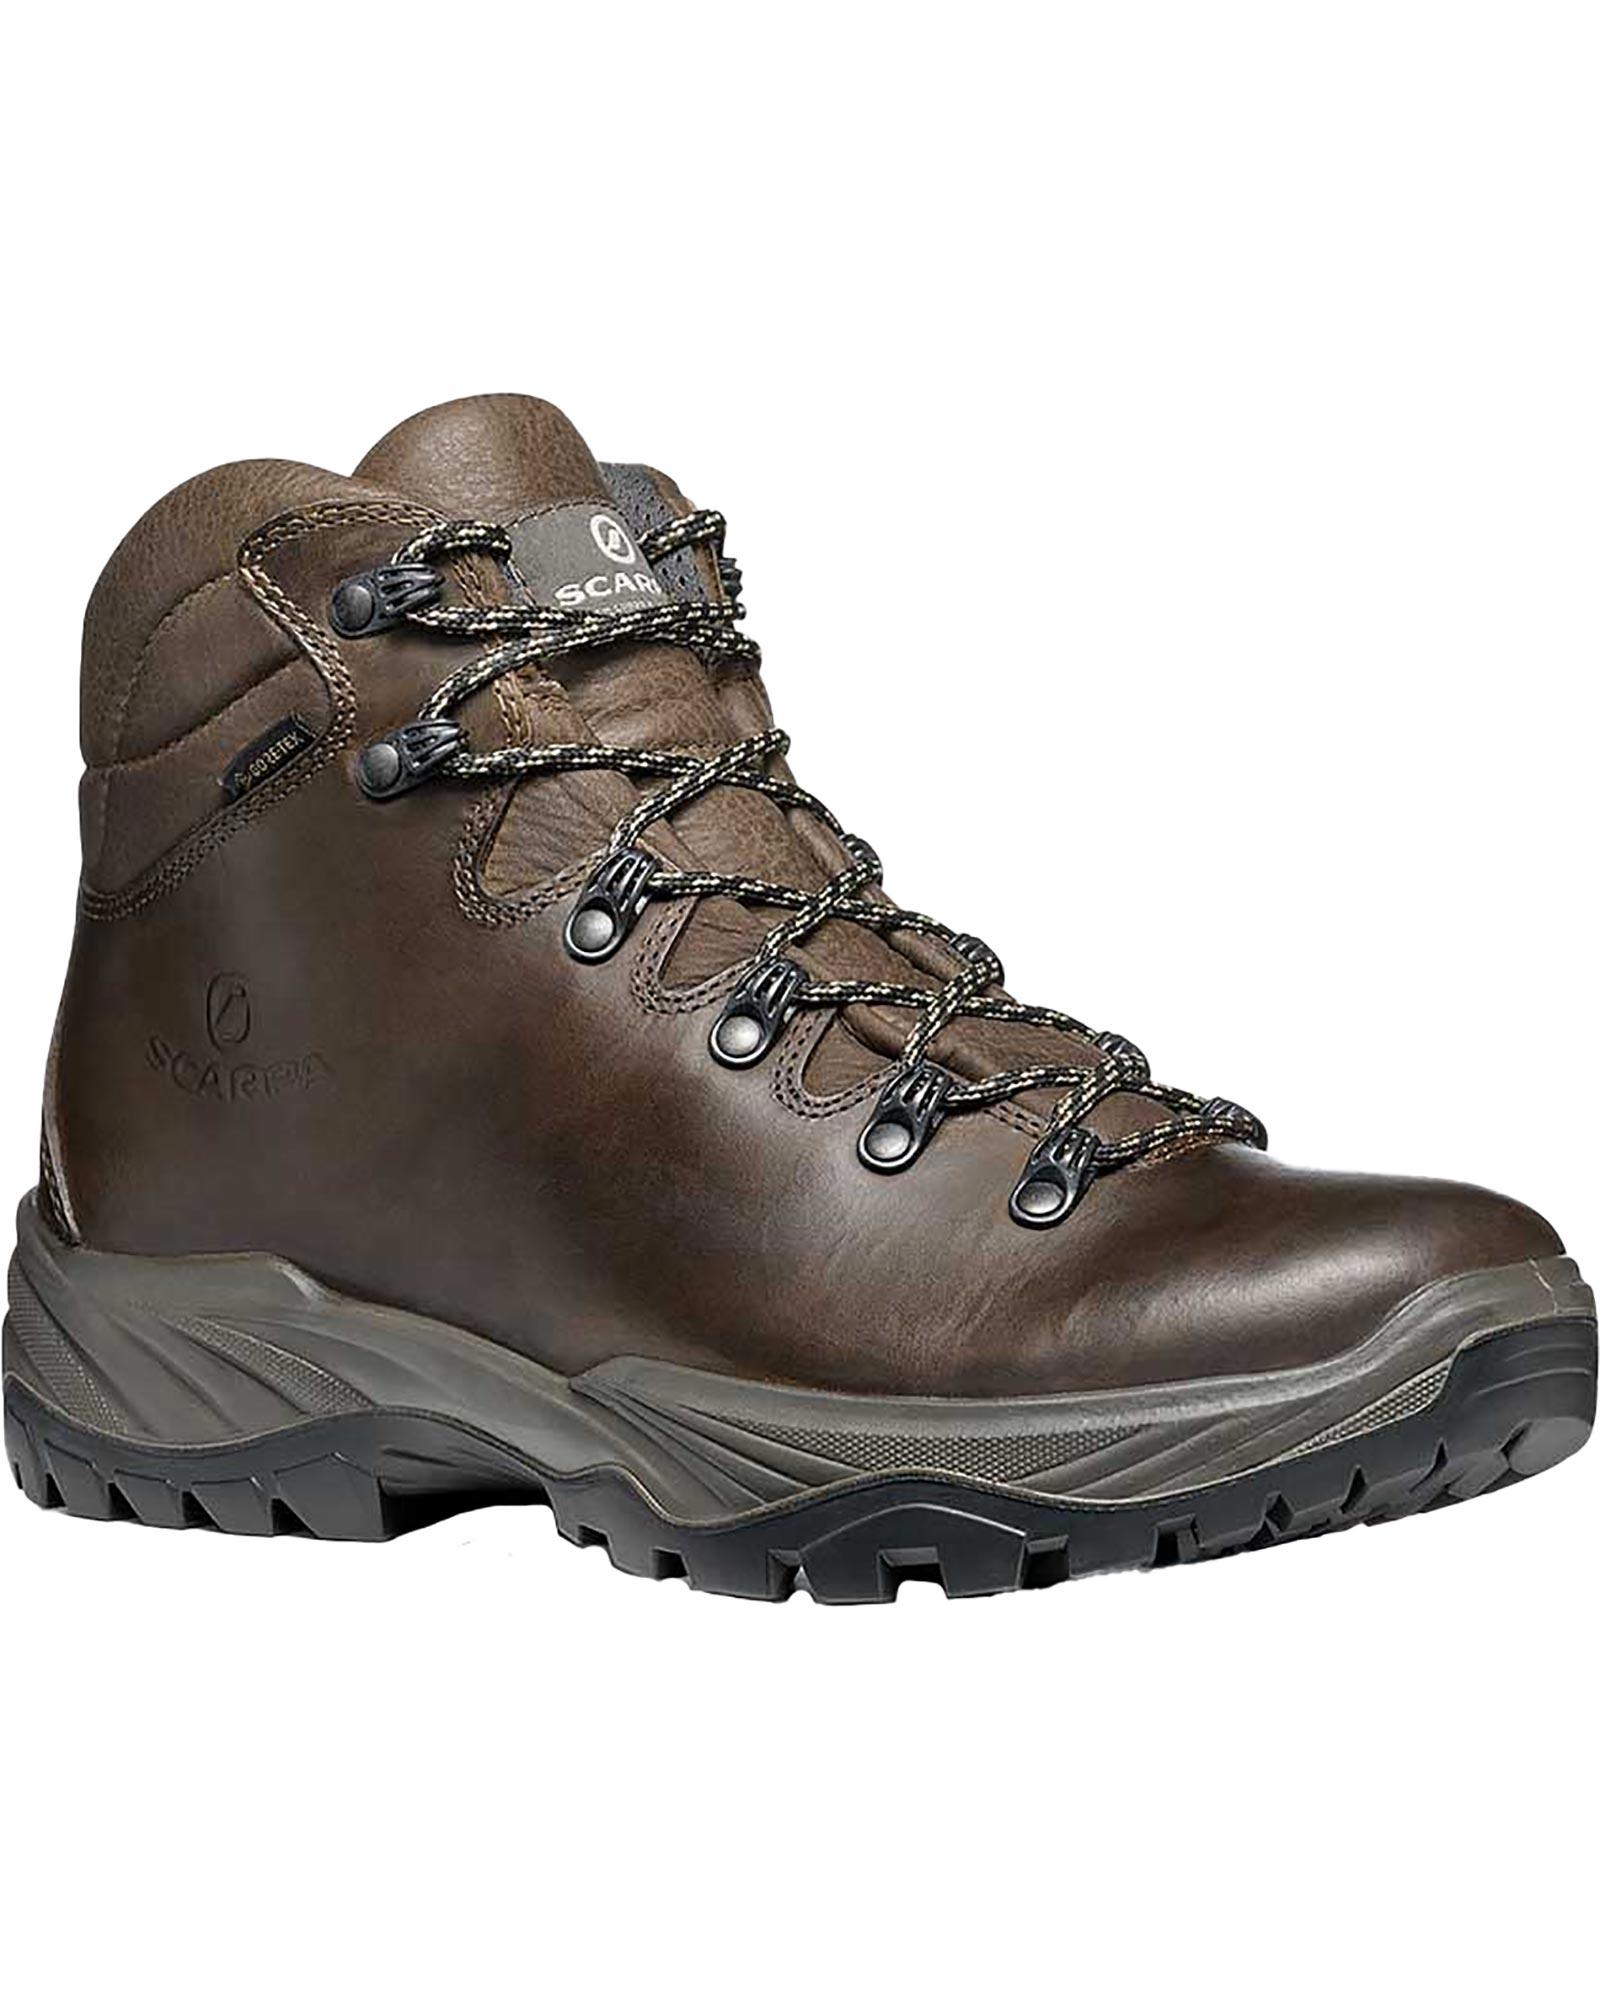 Scarpa Terra GORE-TEX Men's Boots 0